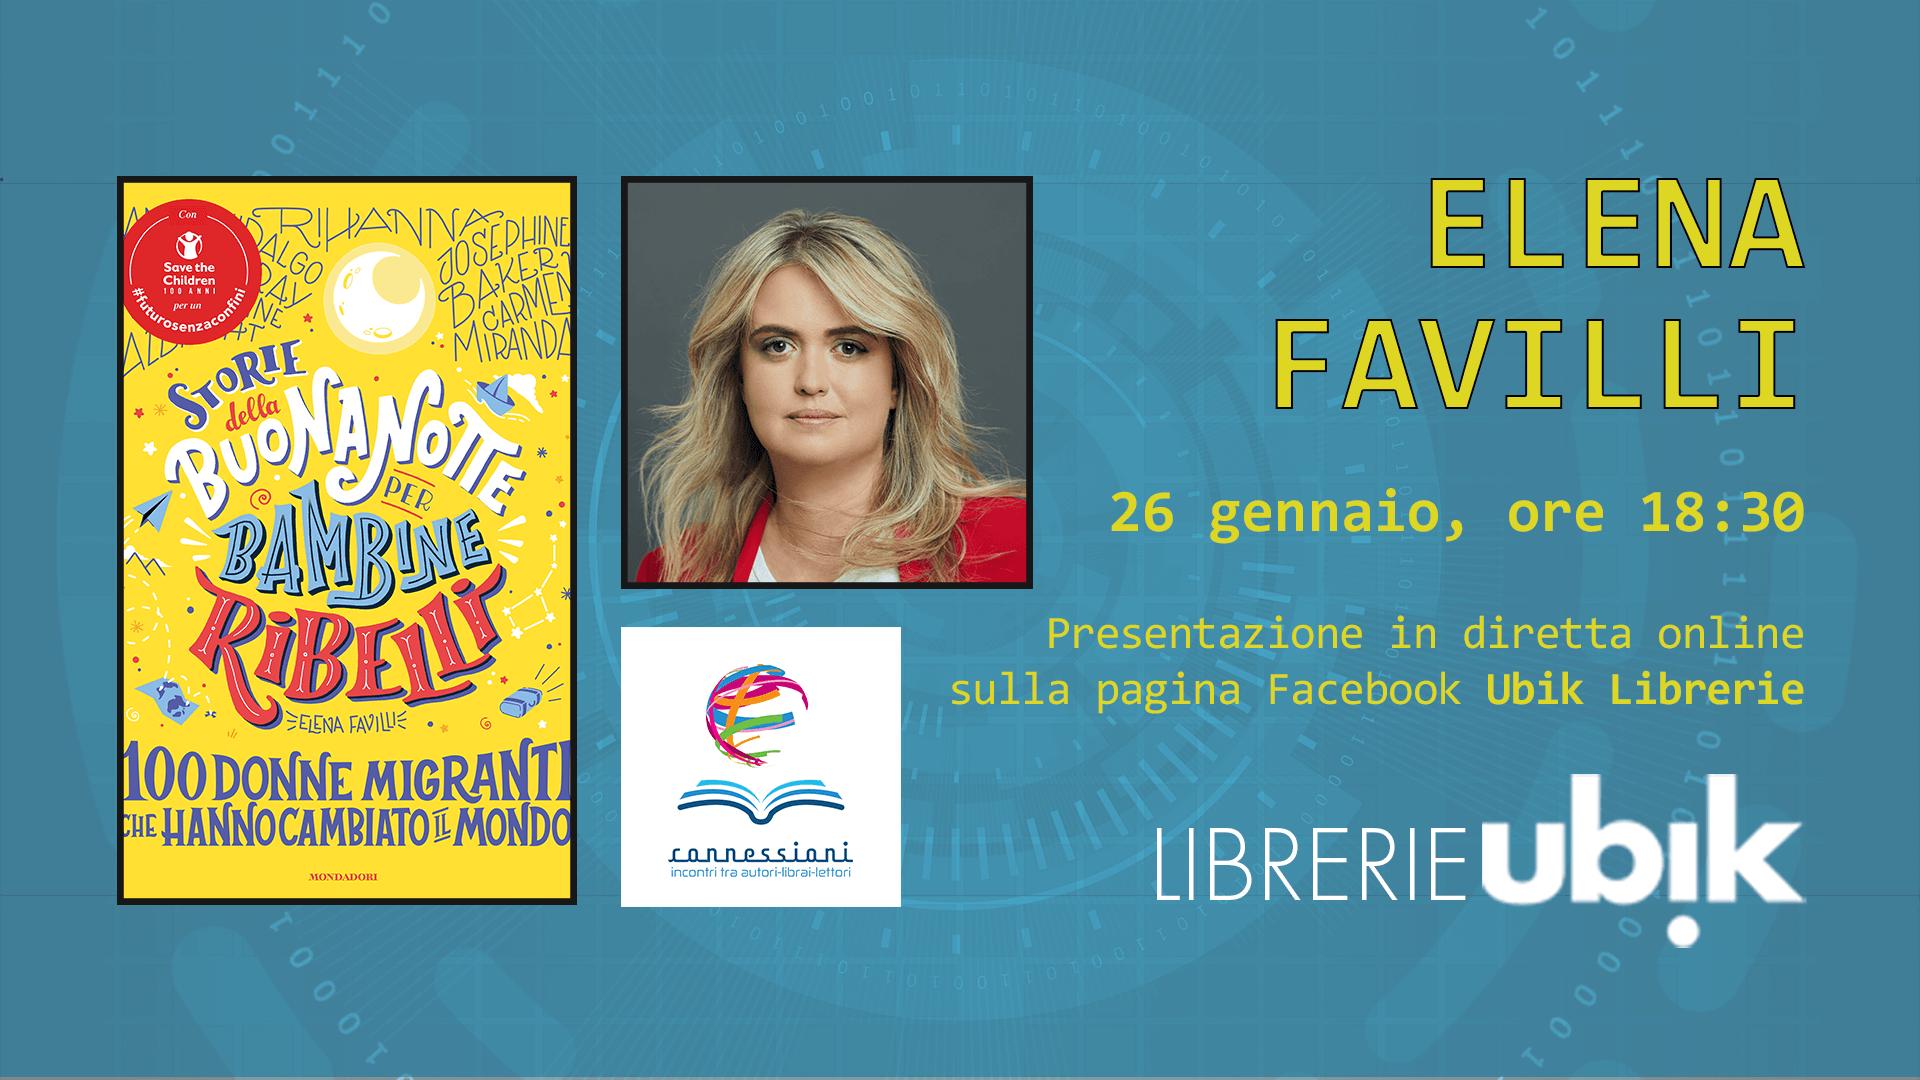 ELENA FAVILLI presenta in diretta online